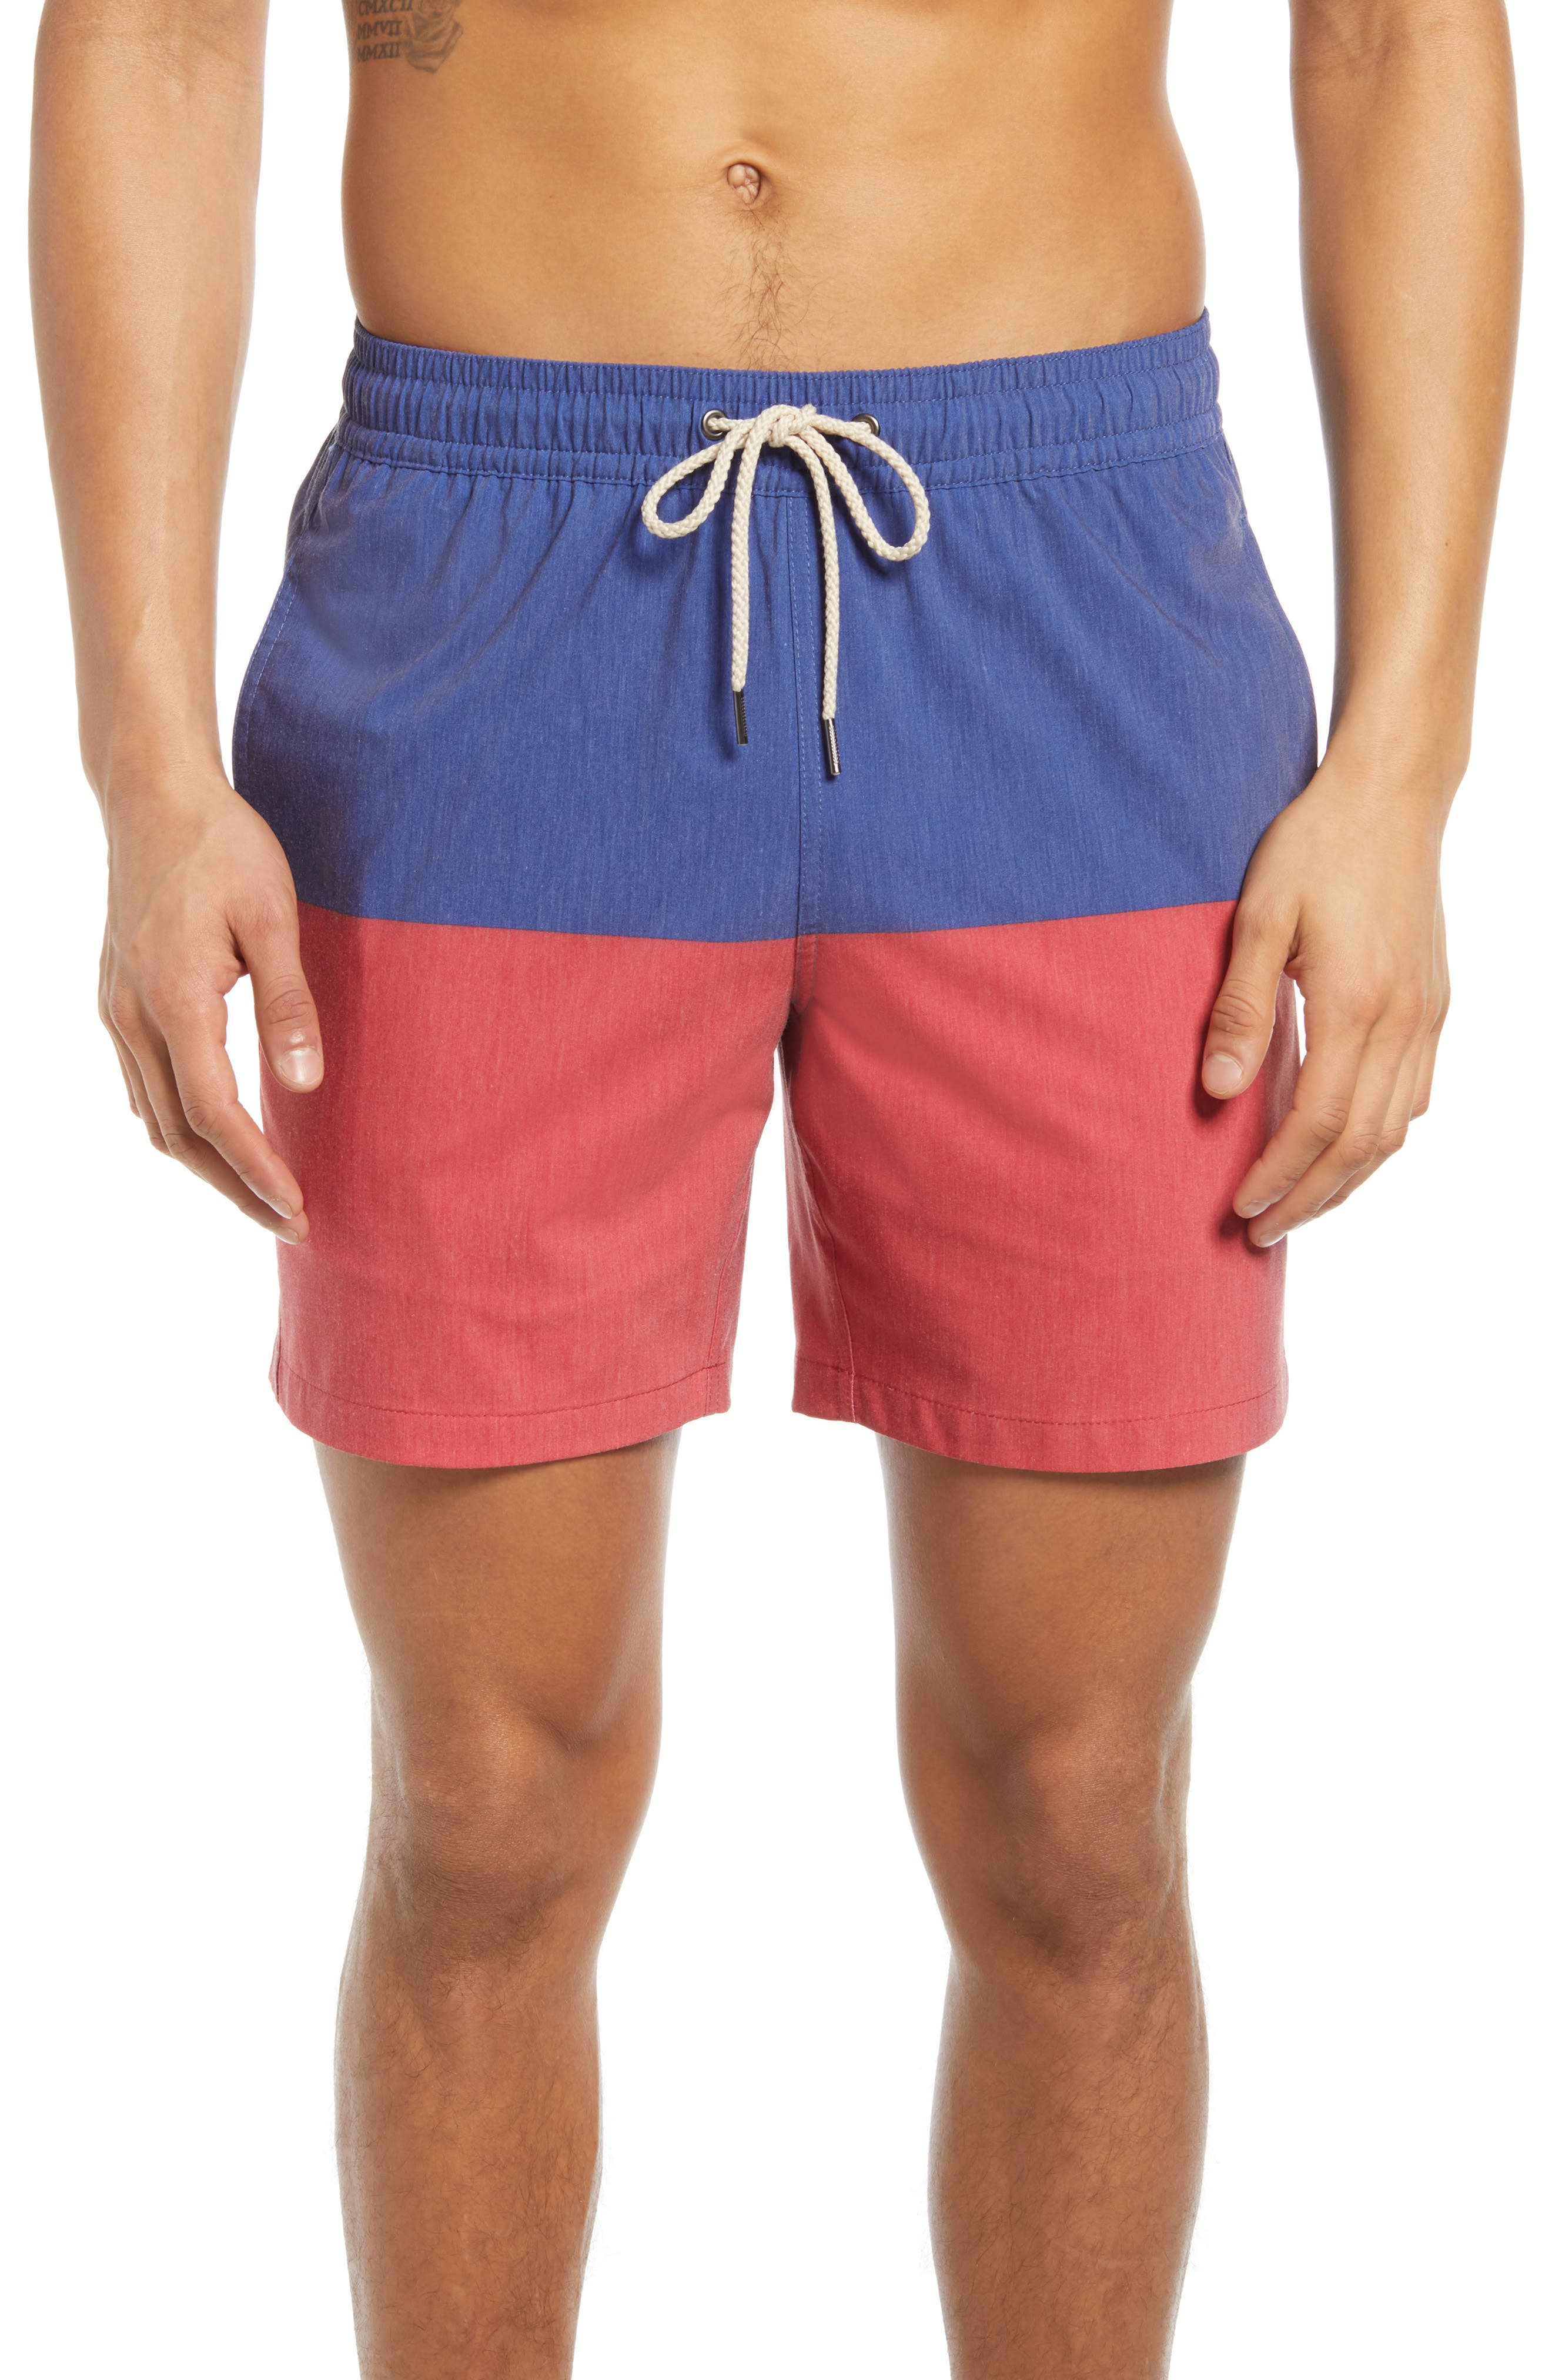 Vintage Men's Swimsuits – 1930s, 1940s, 1950s History Mens Fair Harbor The Bayberry Colorblock Swim Trunks Size XX-Large - Blue $68.00 AT vintagedancer.com